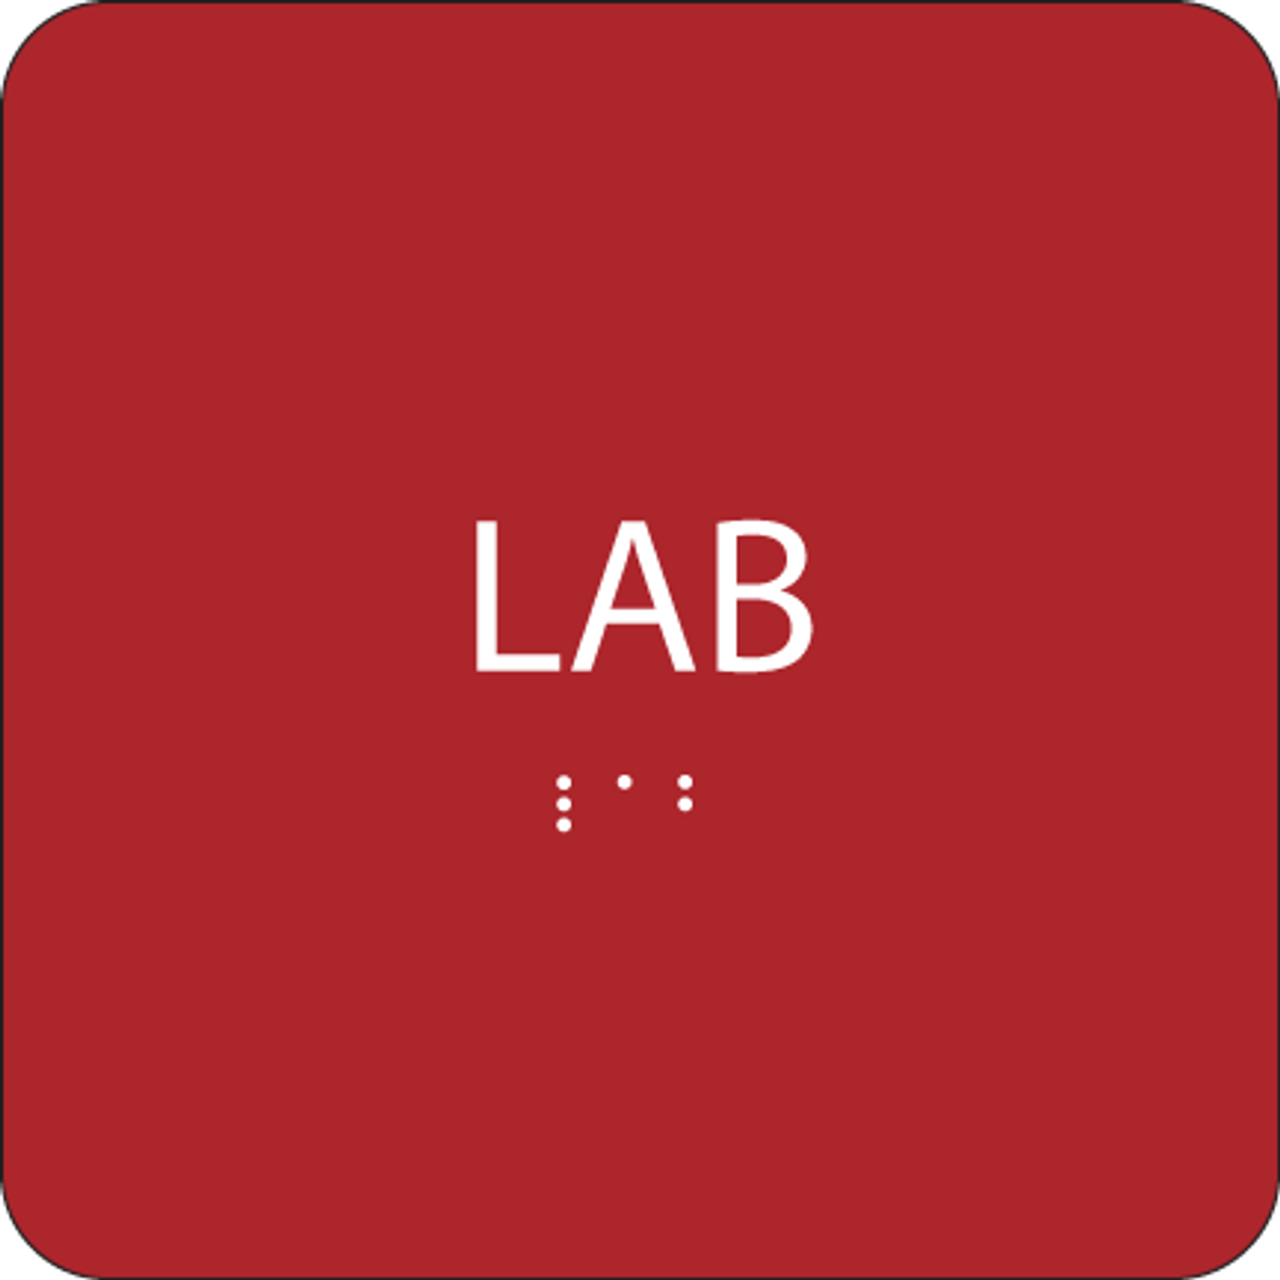 Red Lab ADA Sign